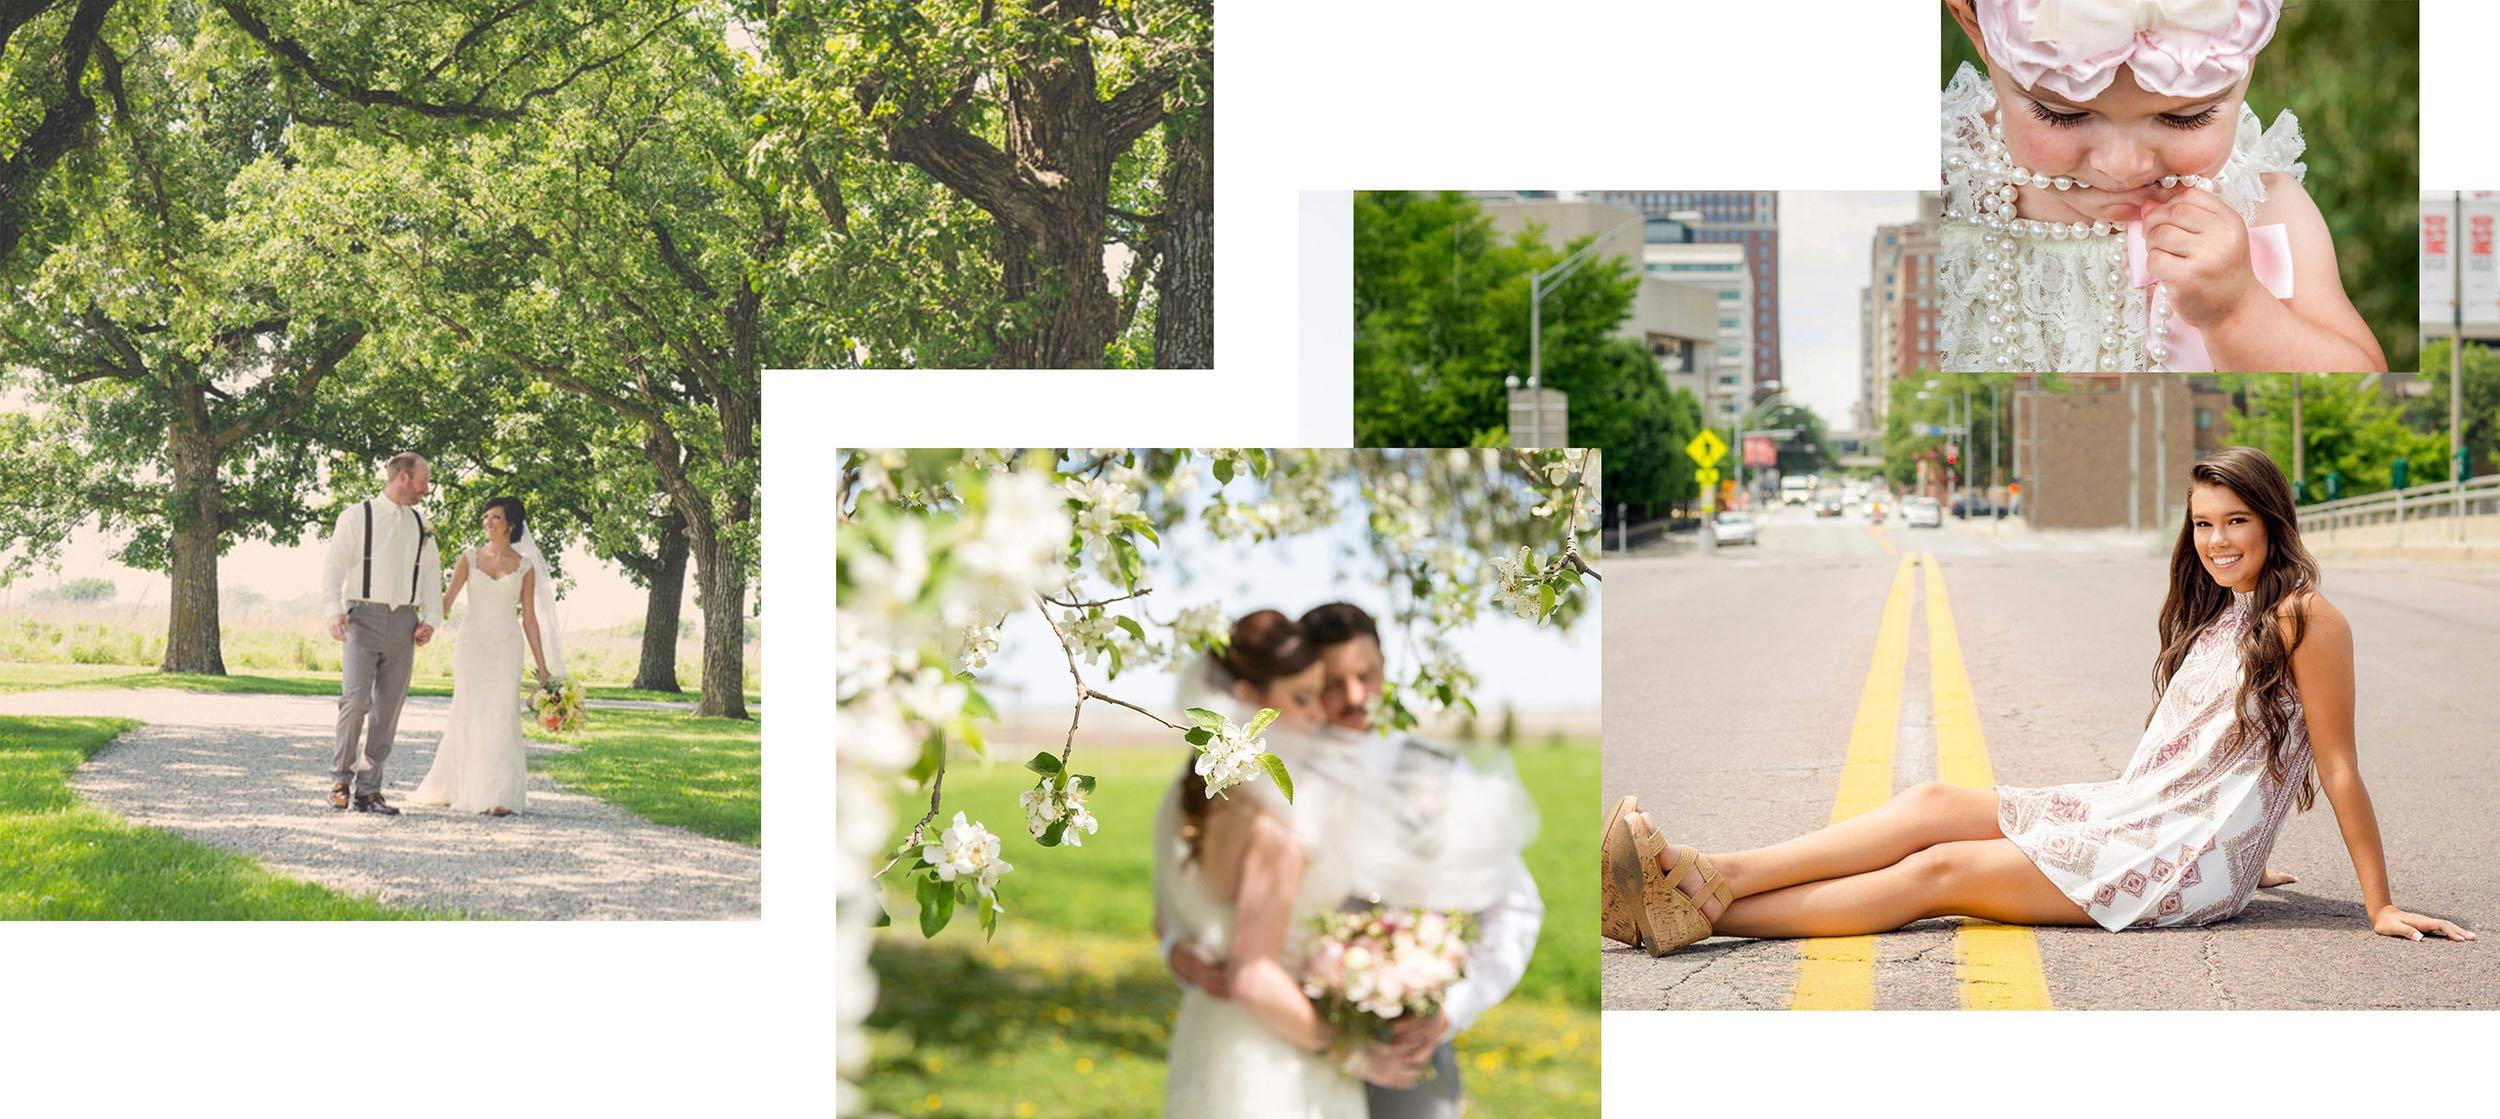 01-Des-Moines-weddings.jpg